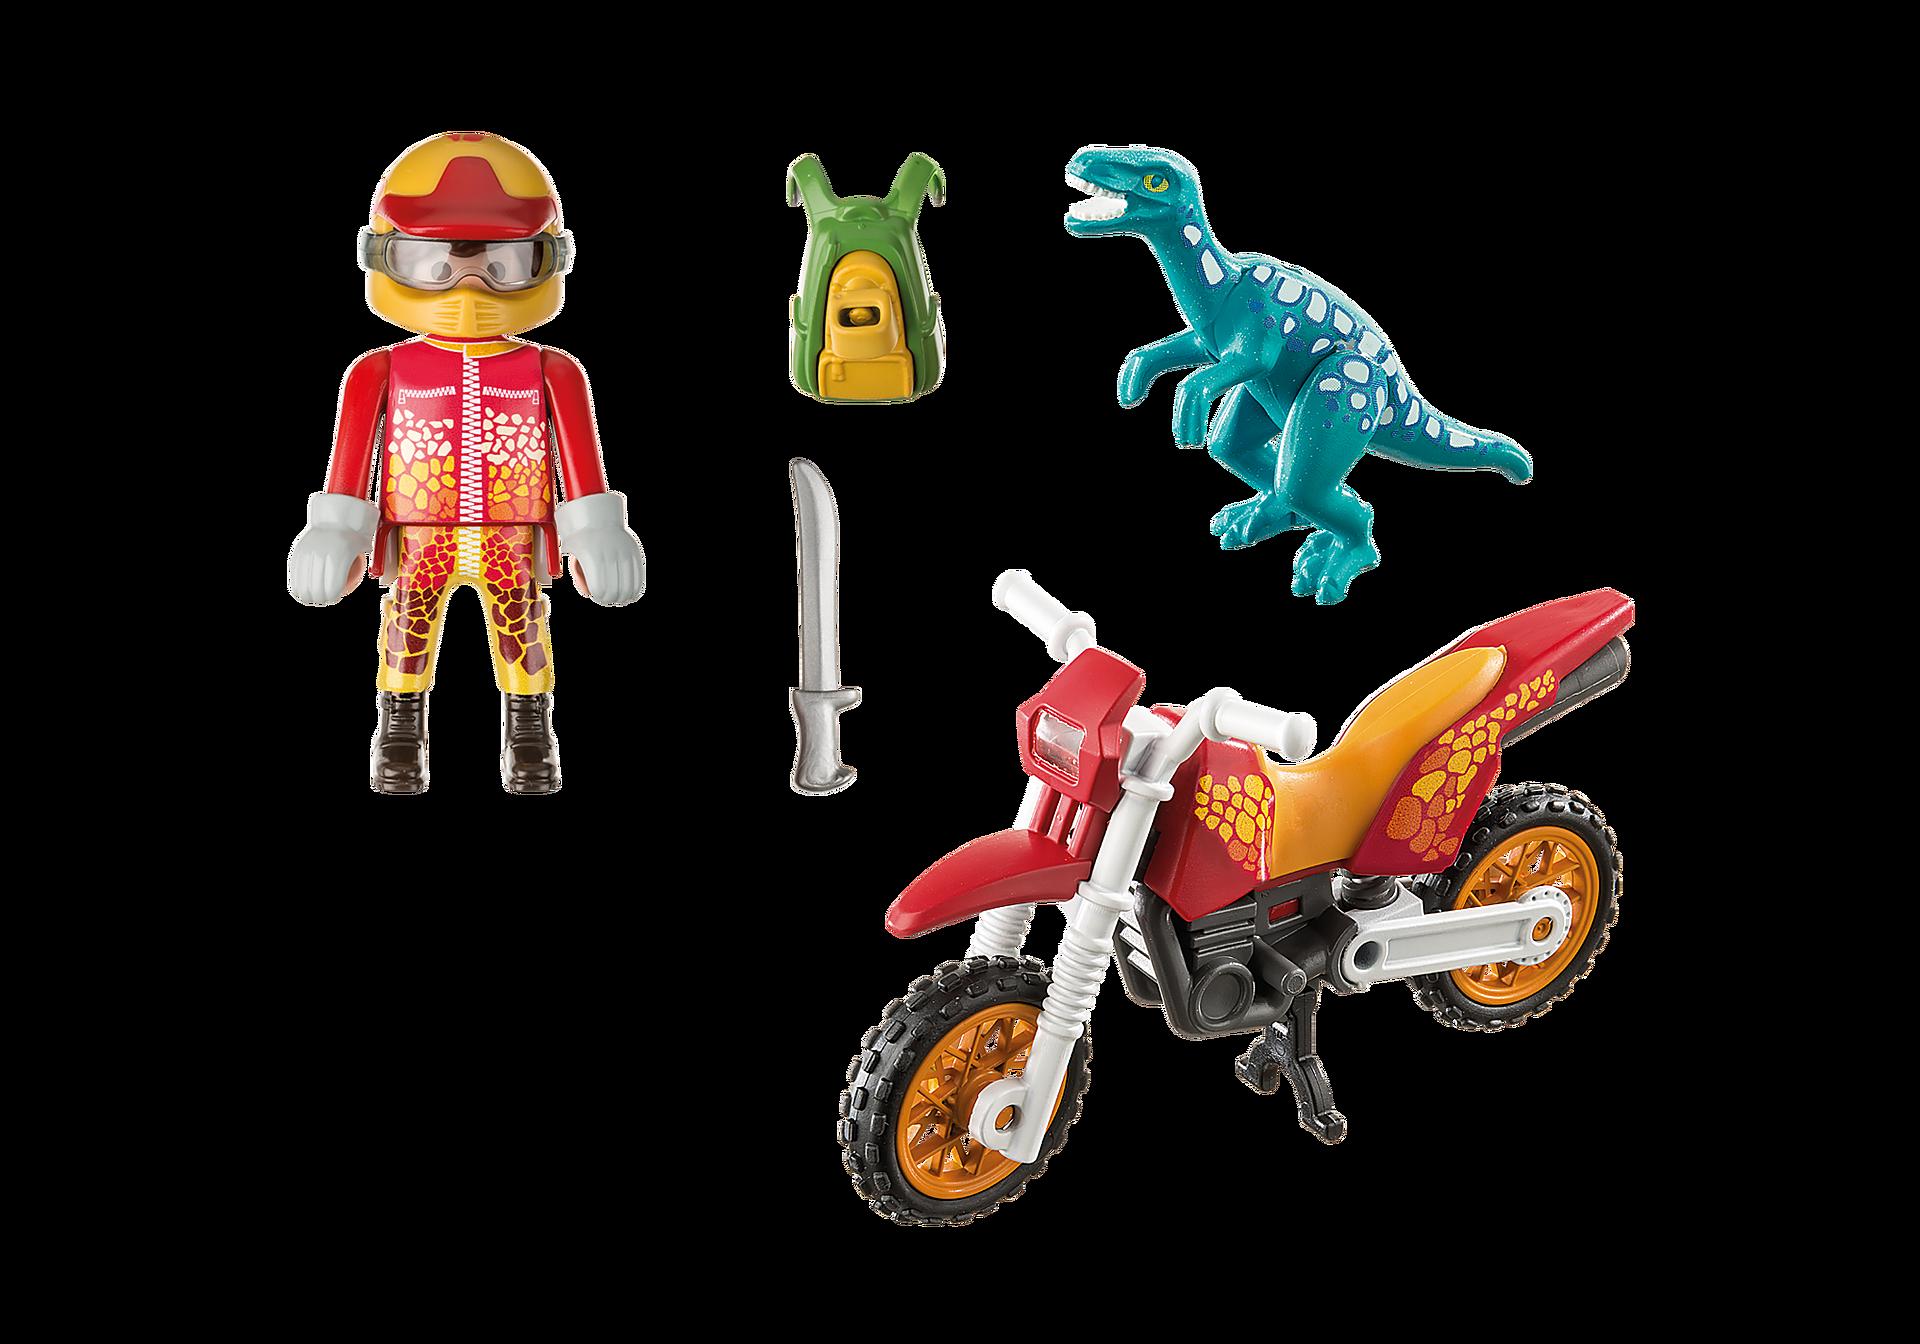 9431 Motocrosscykel med raptor zoom image4